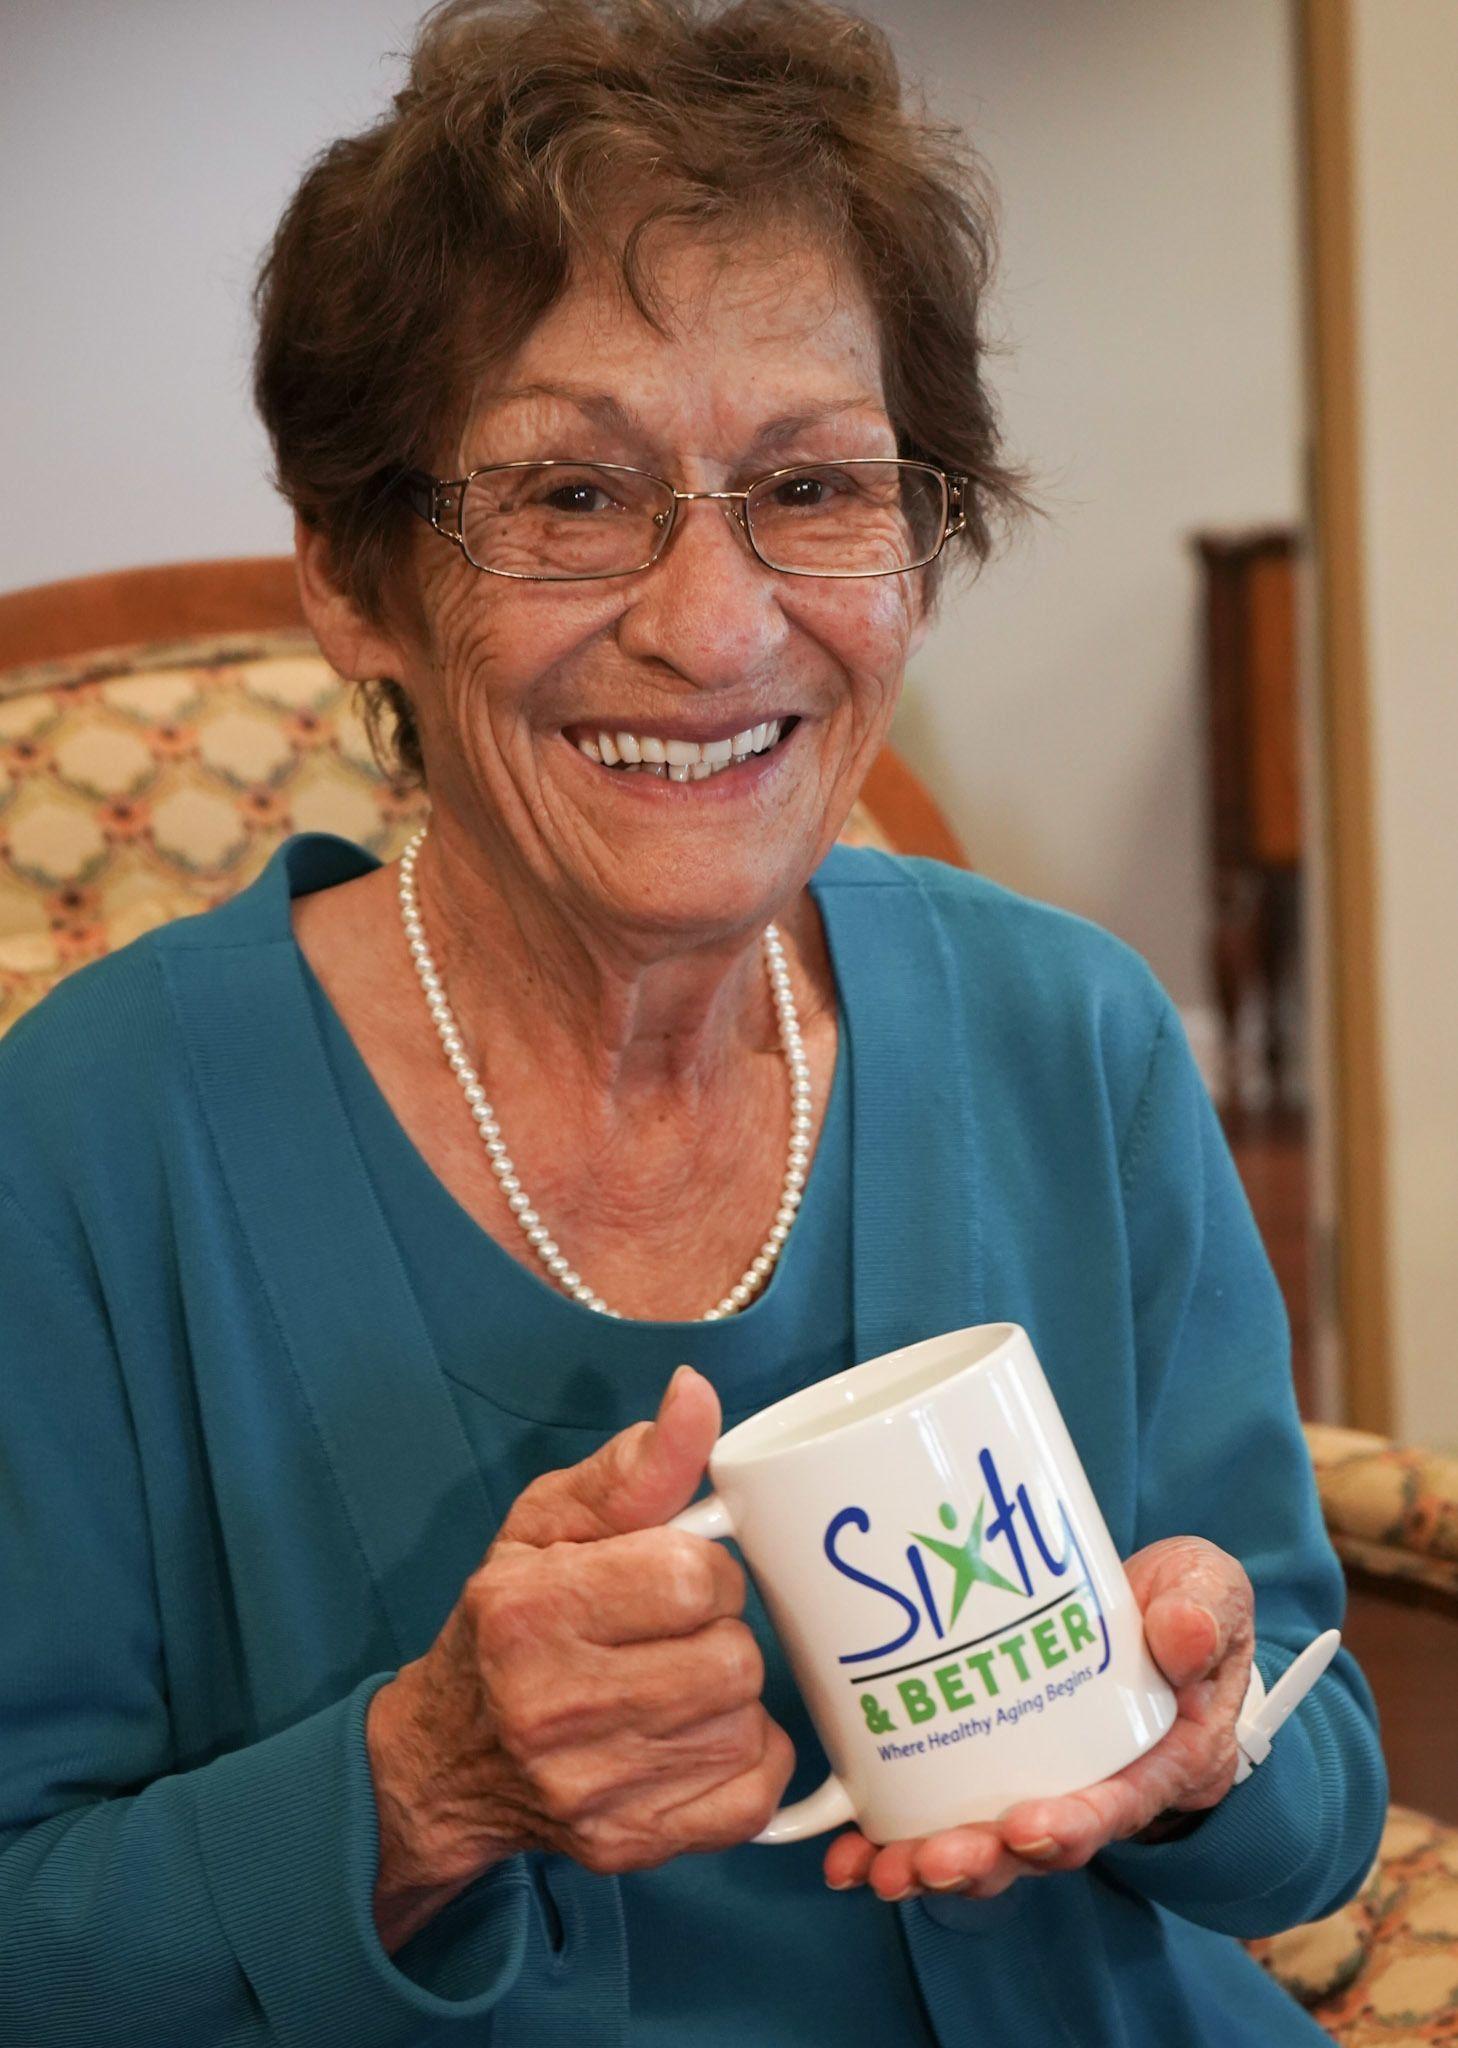 Mary with S&B mug